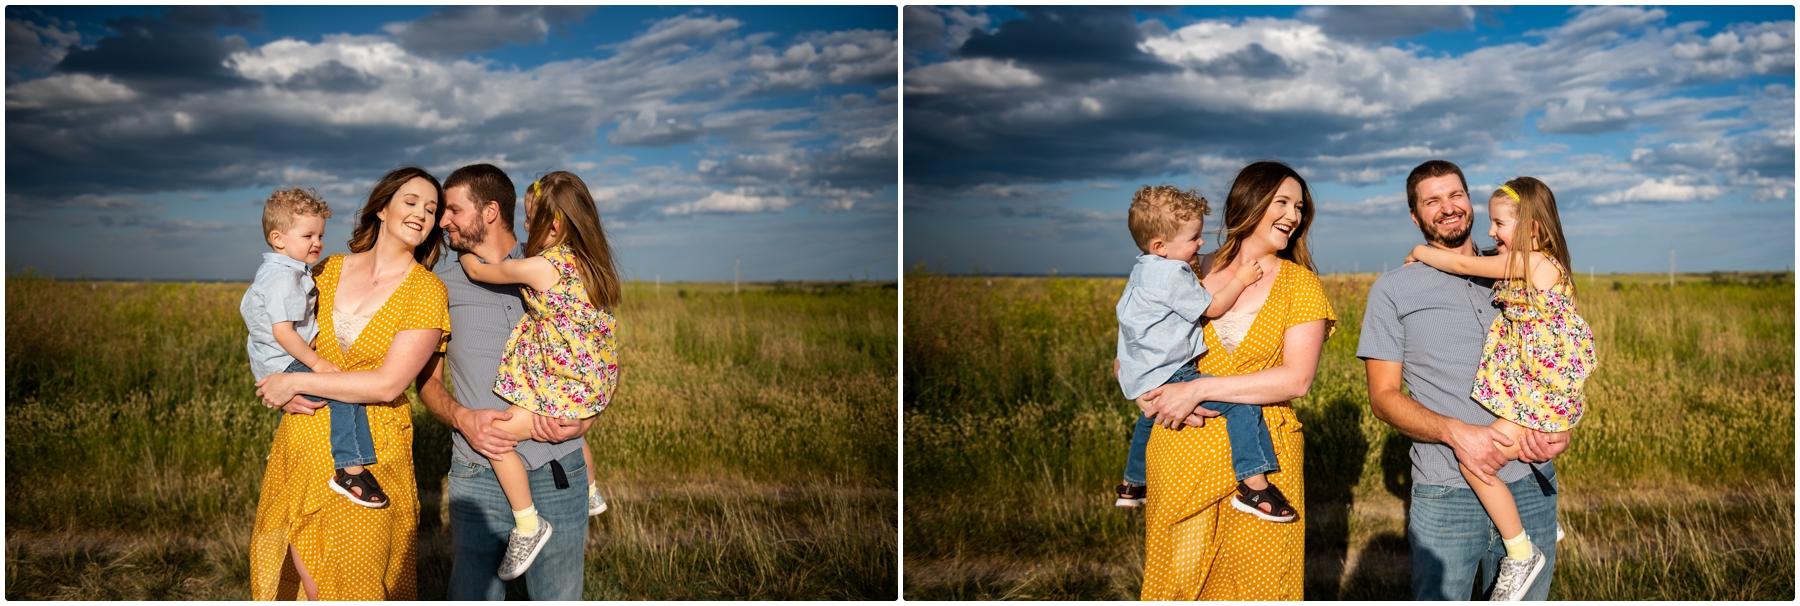 Calgary Family Photographers- Nose Hill Park Family Session